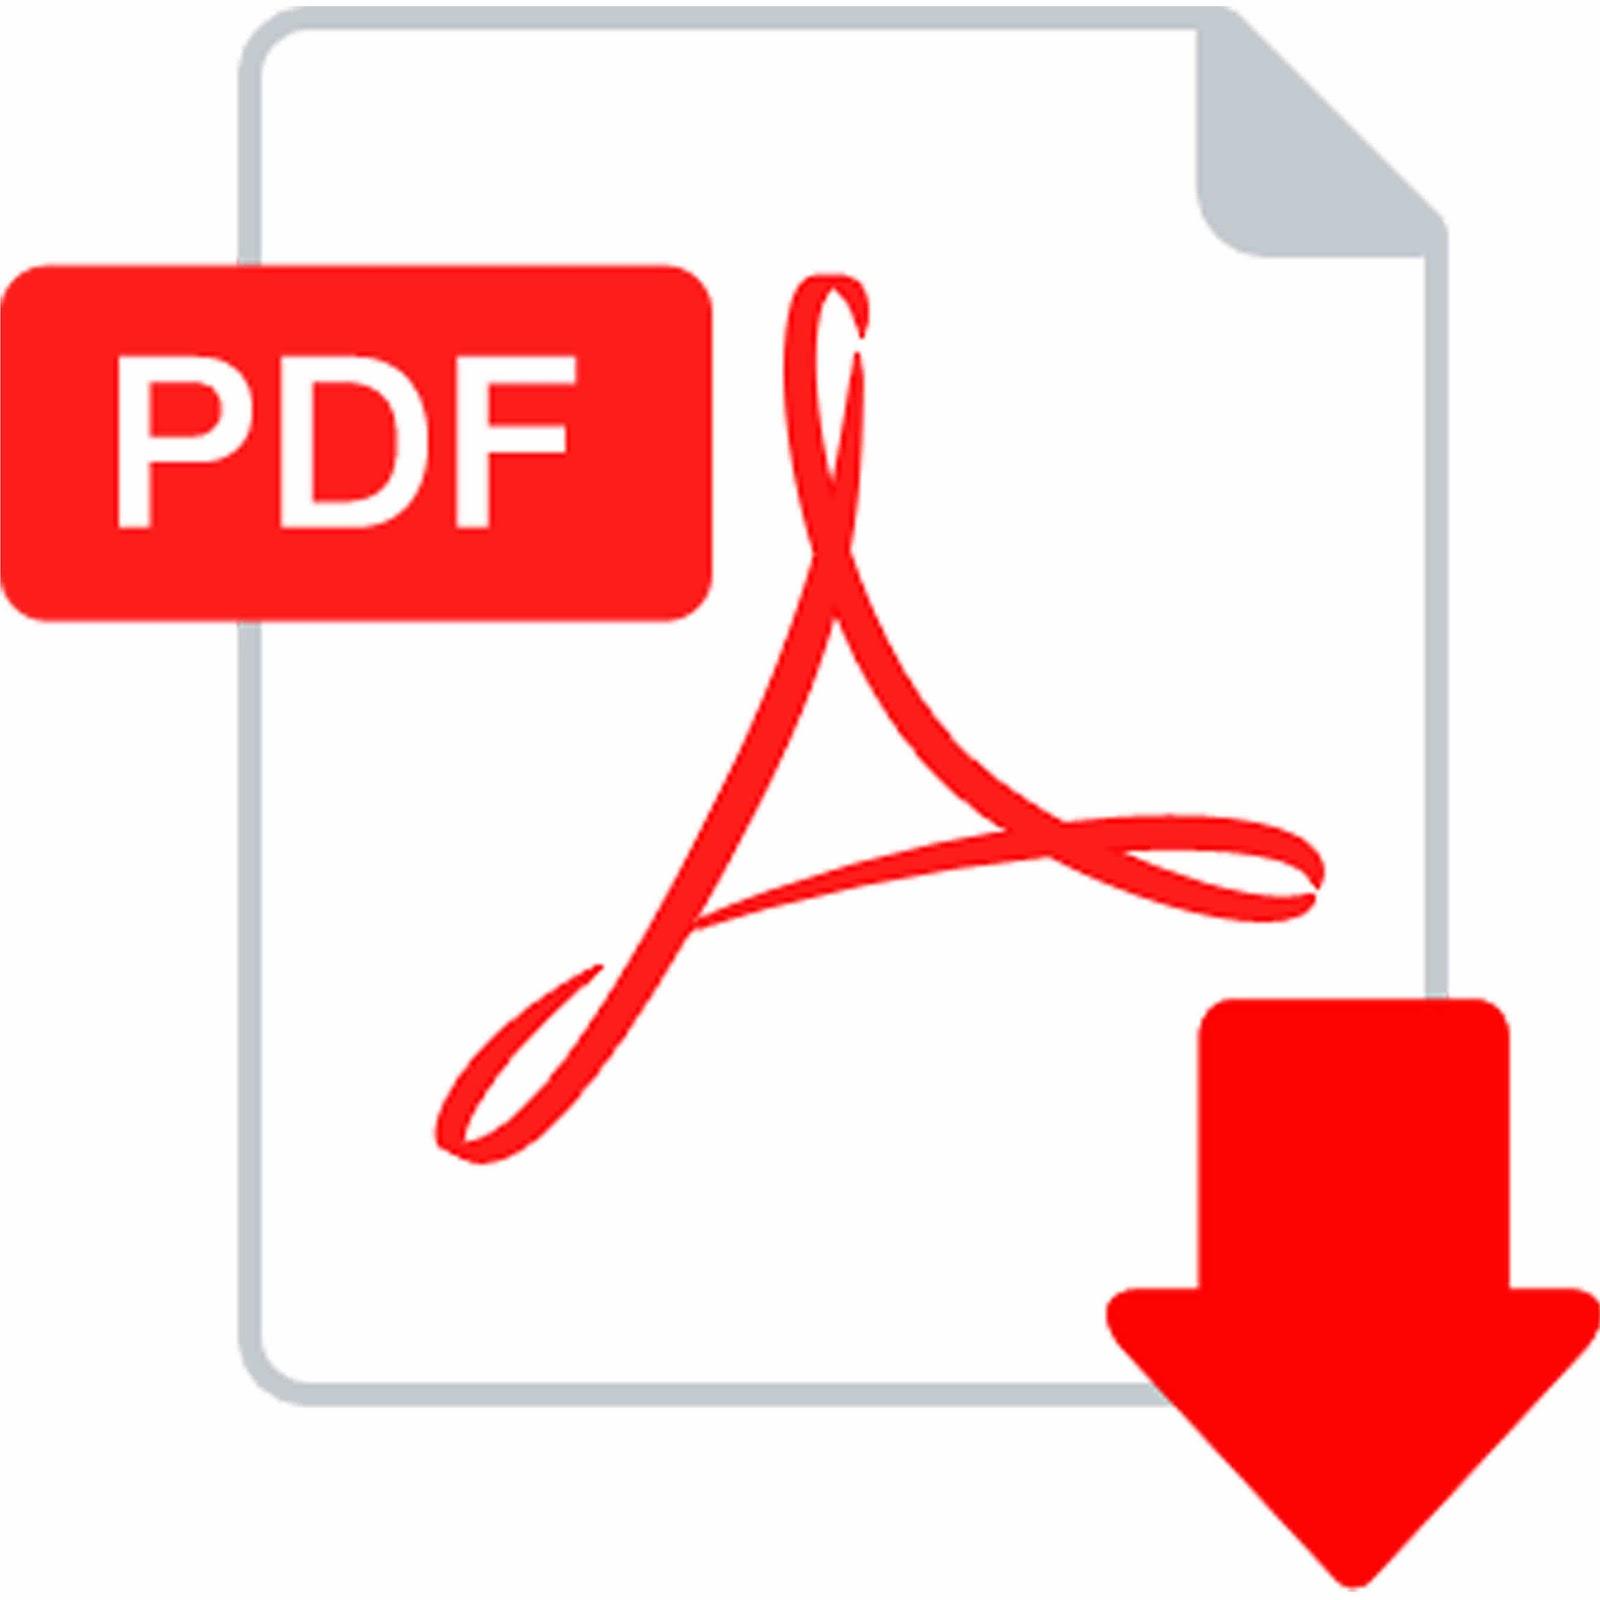 Download free pdf books on philosophy of man